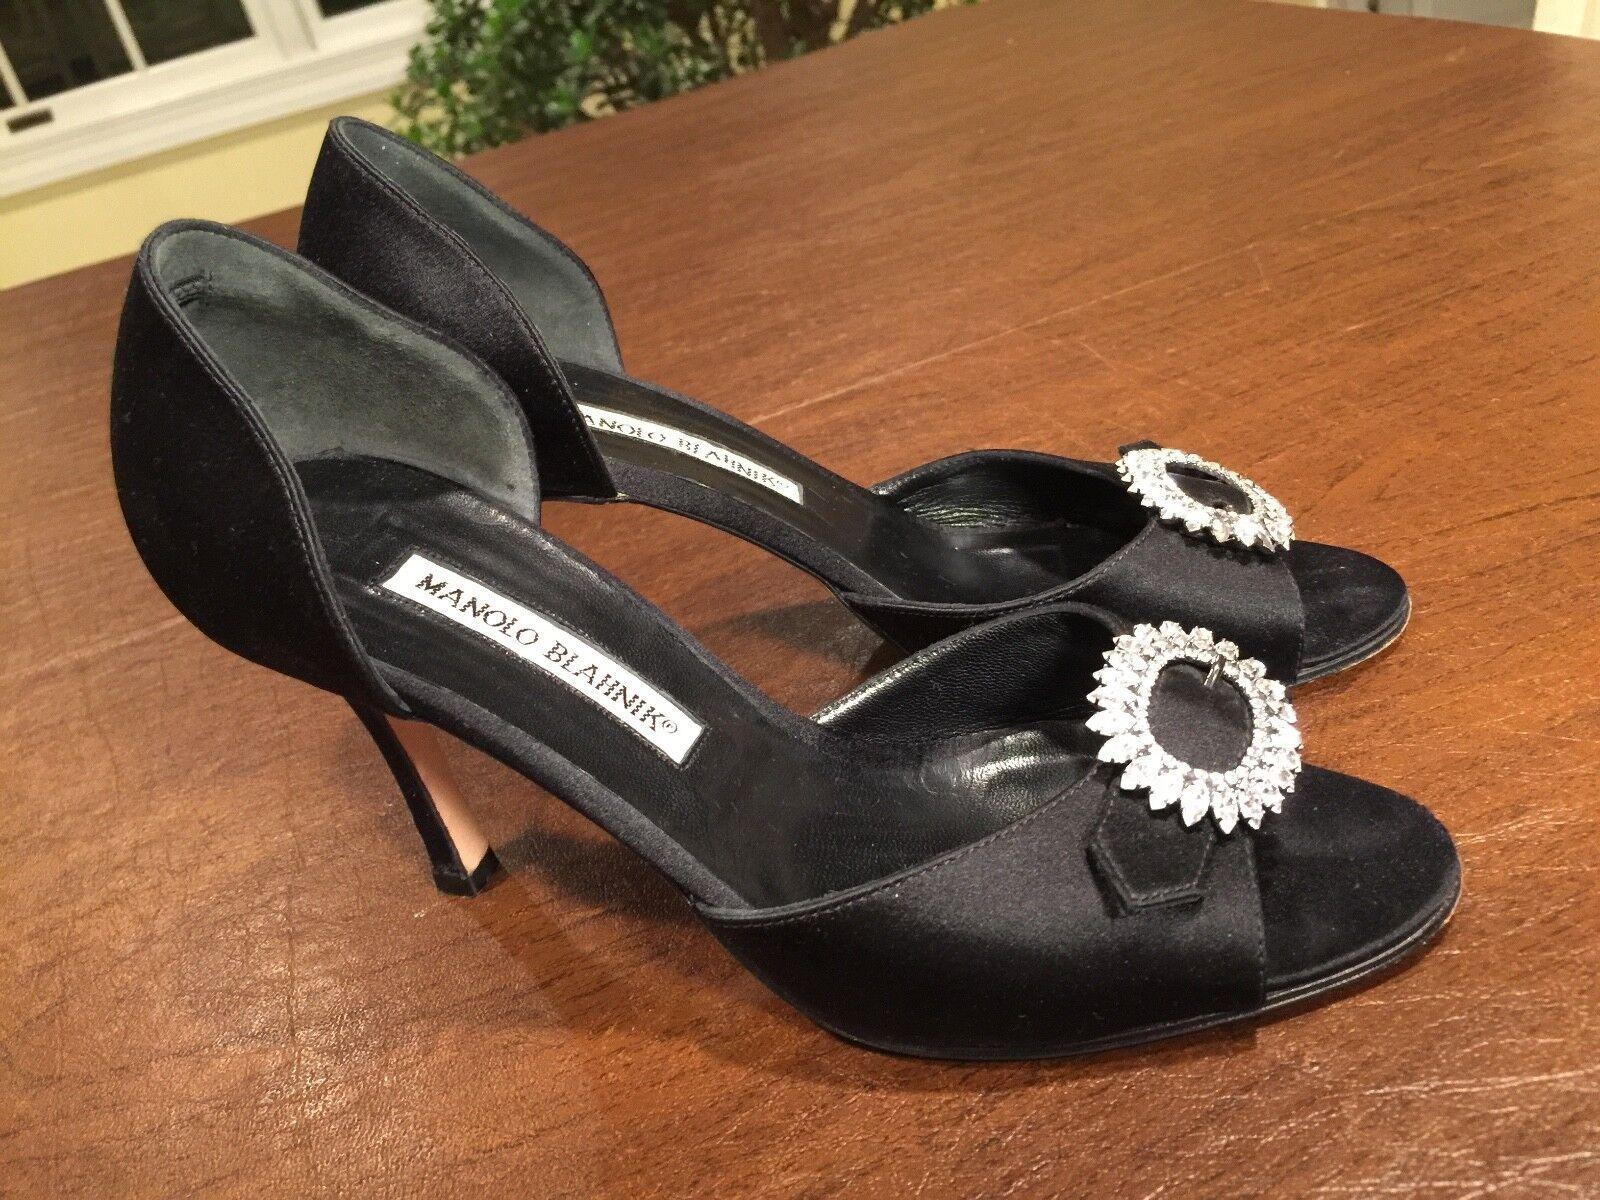 MANOLO BLAKIK  nero Satin D'Orsay Style Peep -Toe Sandals Heels Sz 5.5 EUR 35.5  fabbrica diretta